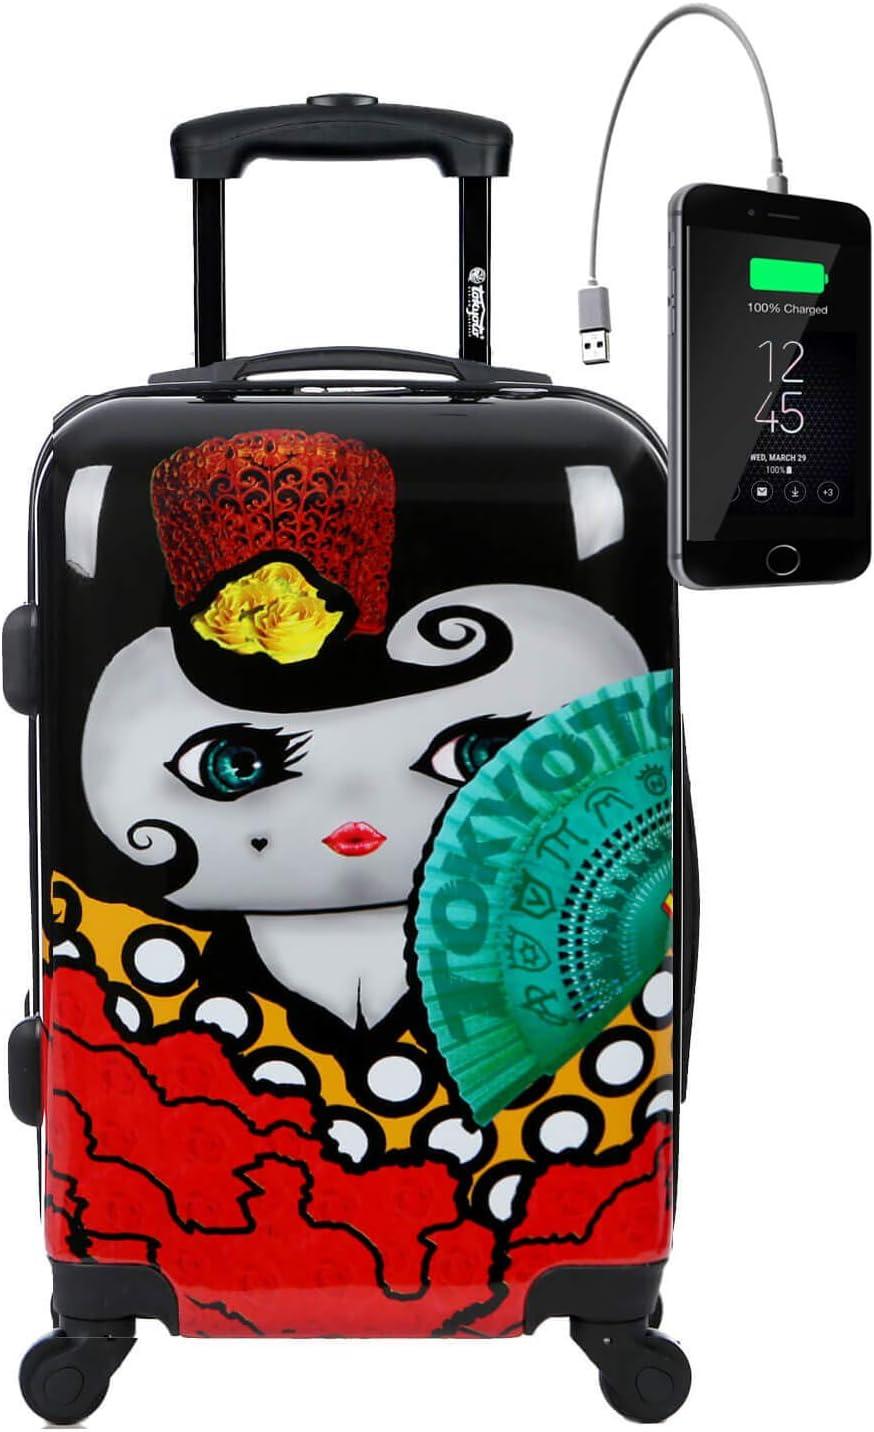 TOKYOTO - Maleta de Cabina Equipaje de Mano, Flamenca con Cargador USB, 8000mAh, 55x40x20 cm | Maleta Juvenil, Trolley de Viaje Ryanair, Easyjet | Maleta de Viaje Rígida Divertida